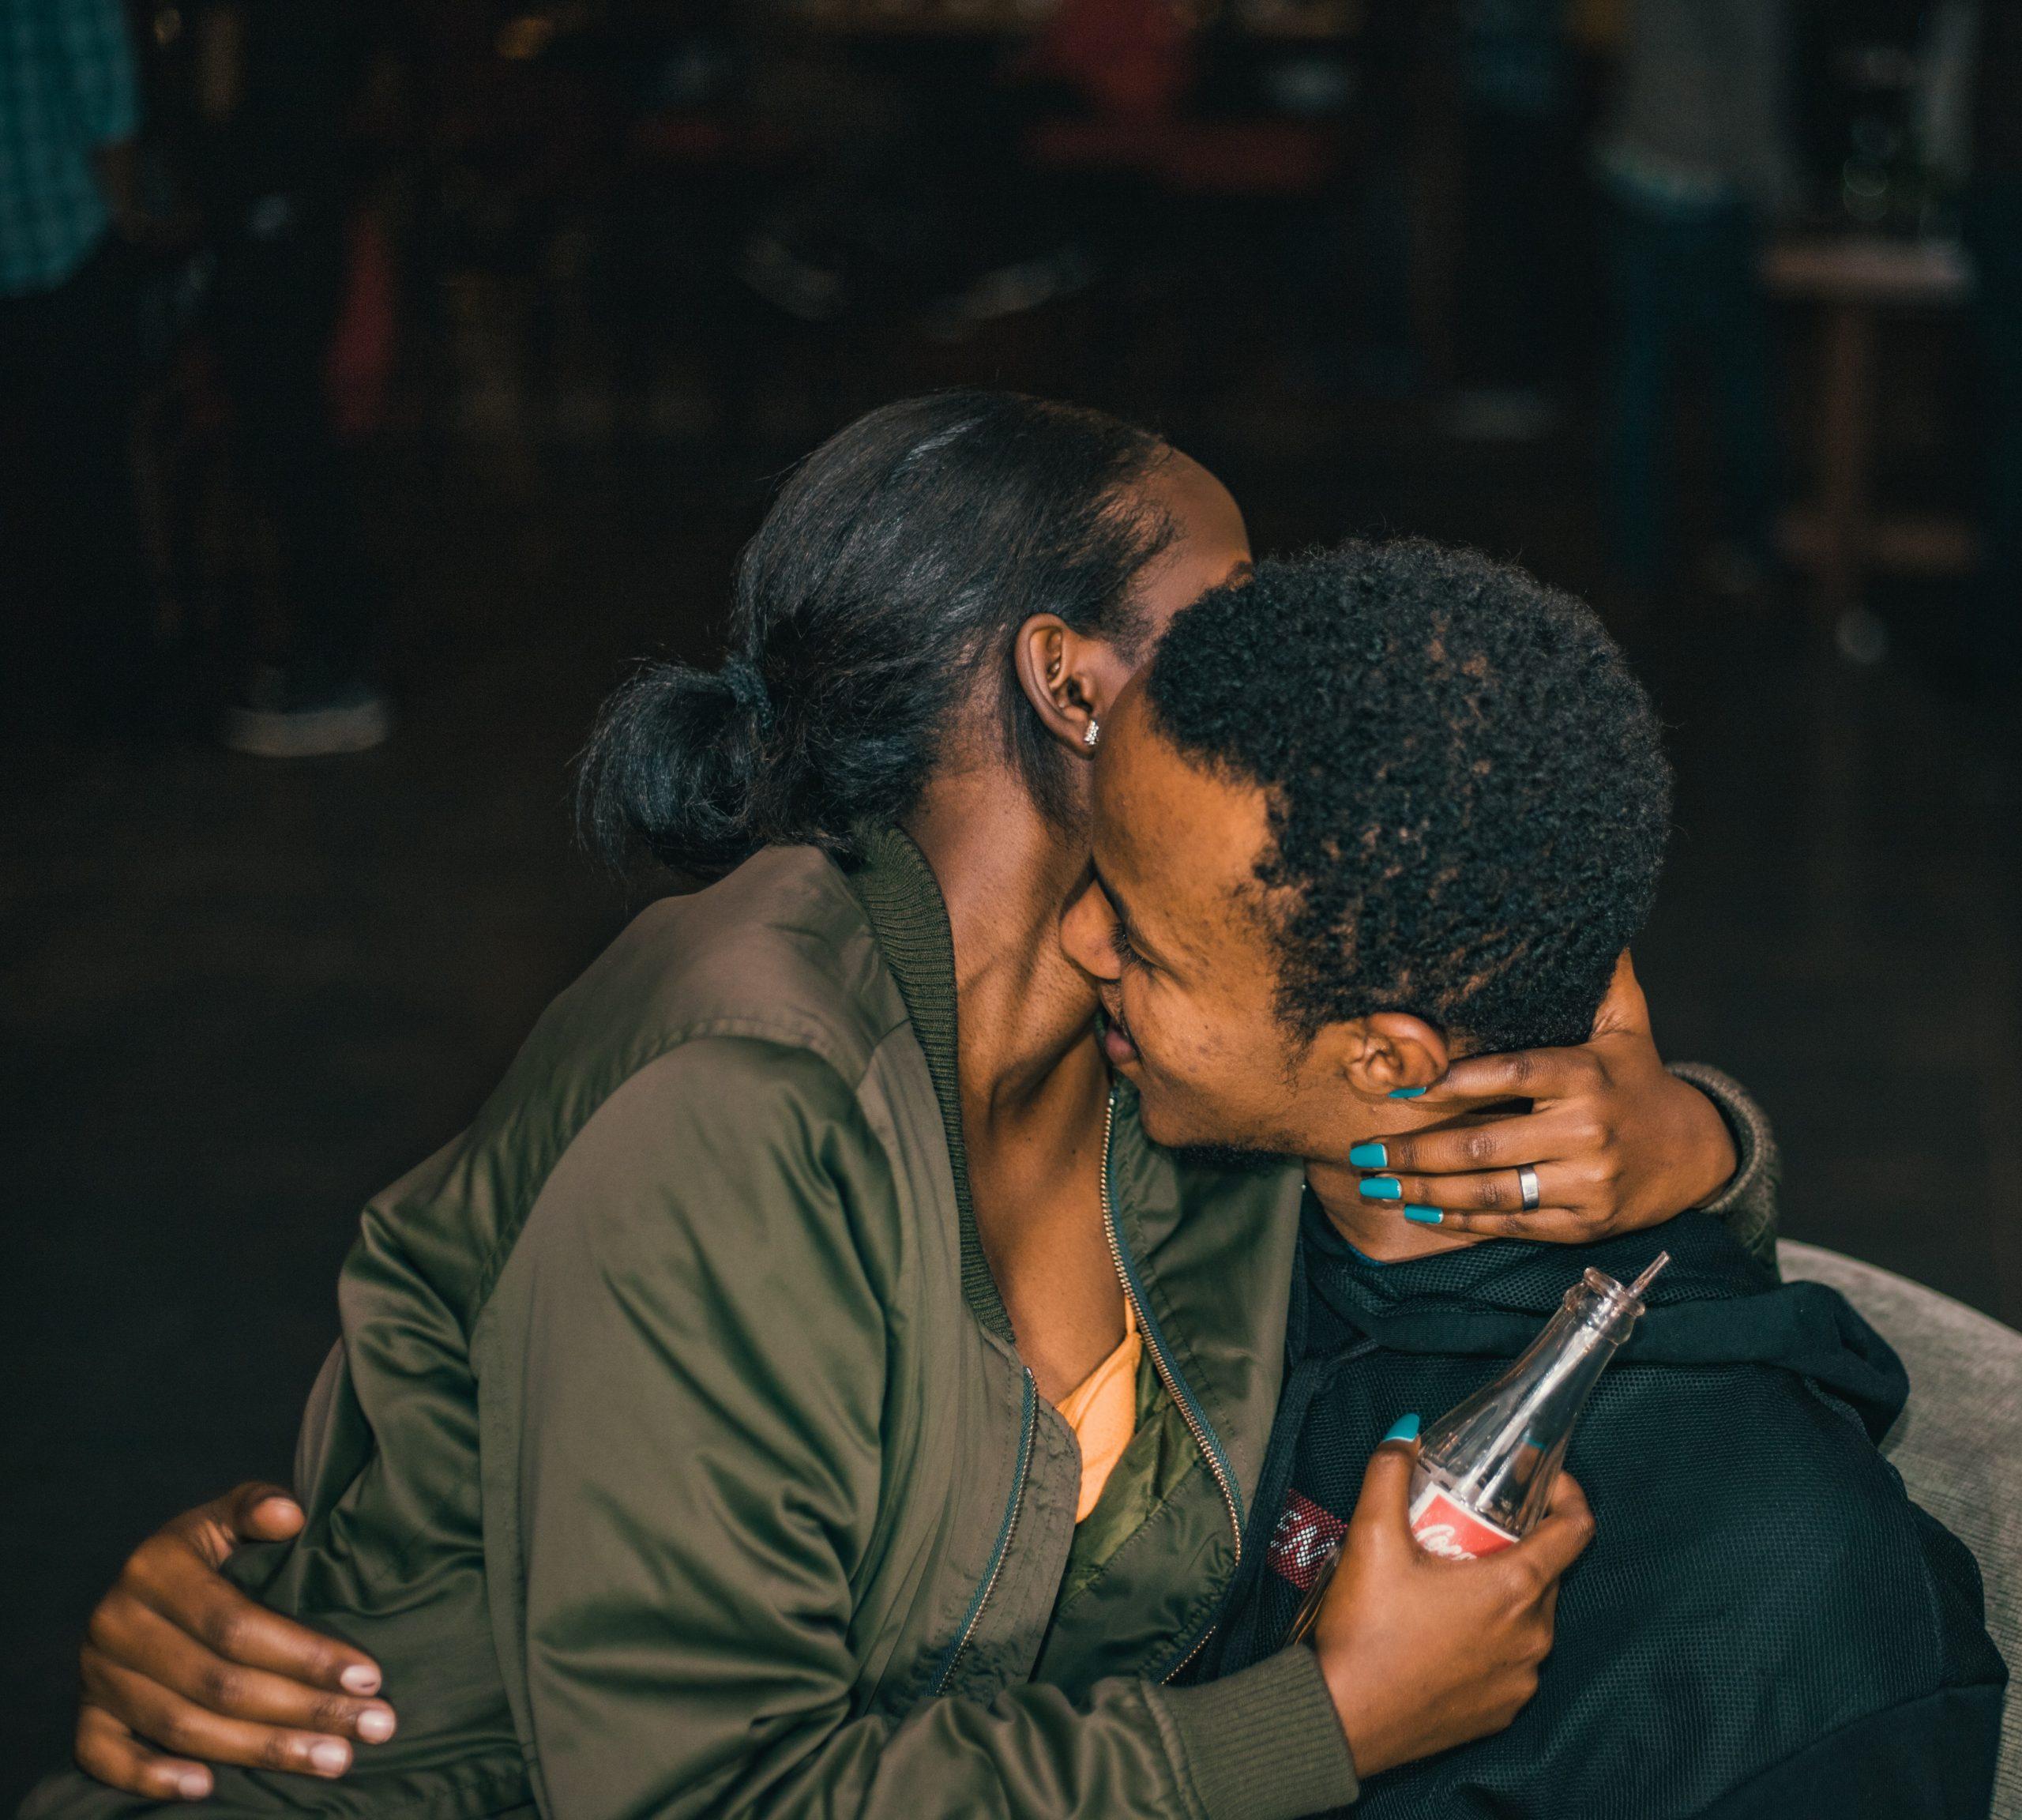 Men dating black 10 Reasons